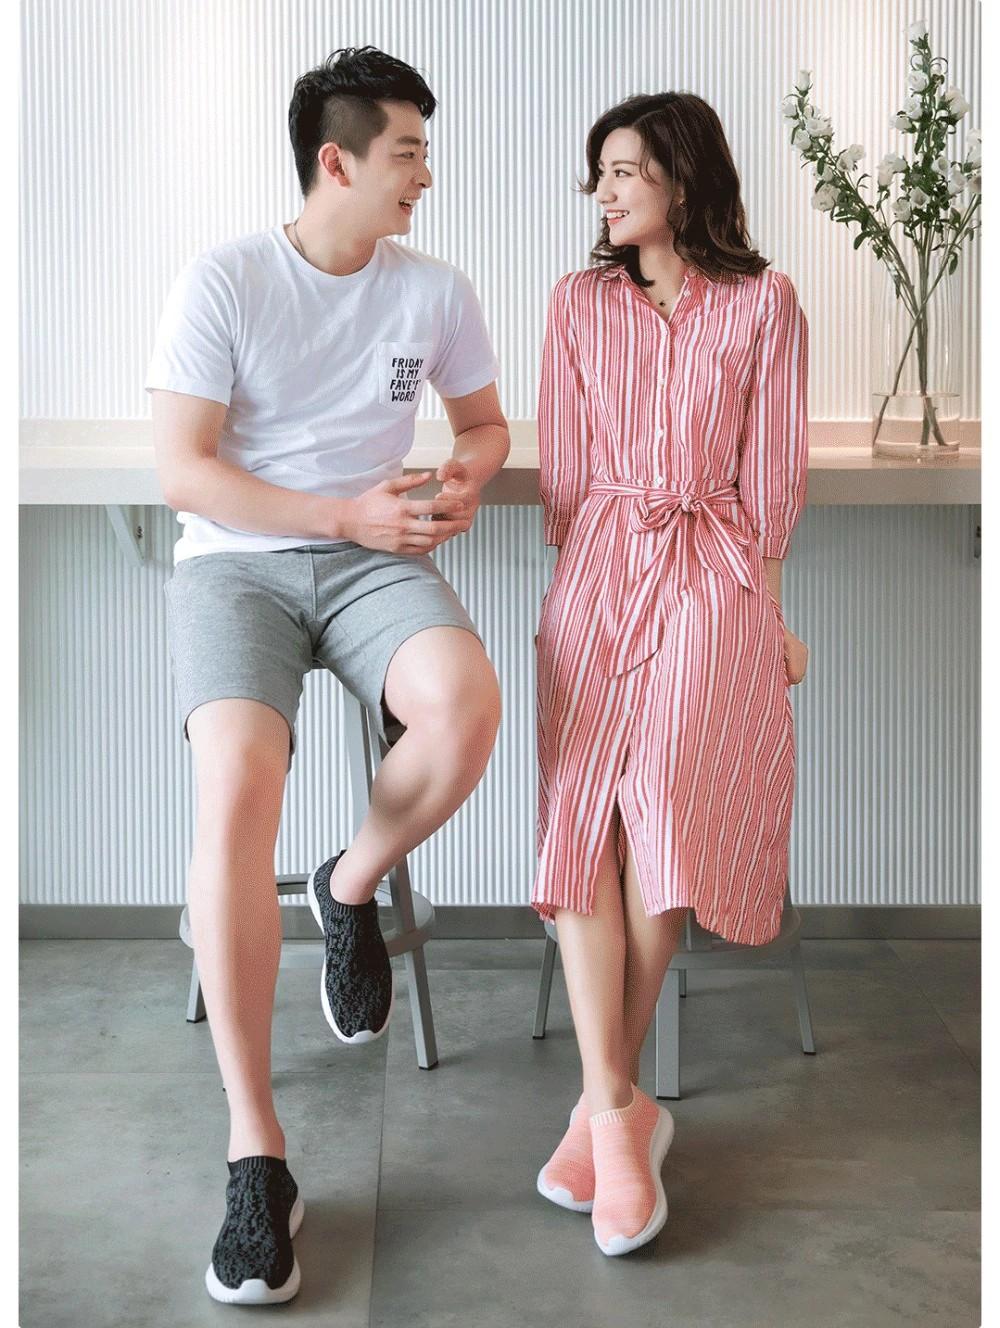 Xiaomi UREVO Leisure Light Sneaker Sport Gym Shoes Lightweight Ventilate Elastic Wearable Outdoor Sport Shoes for MenWomen (9)